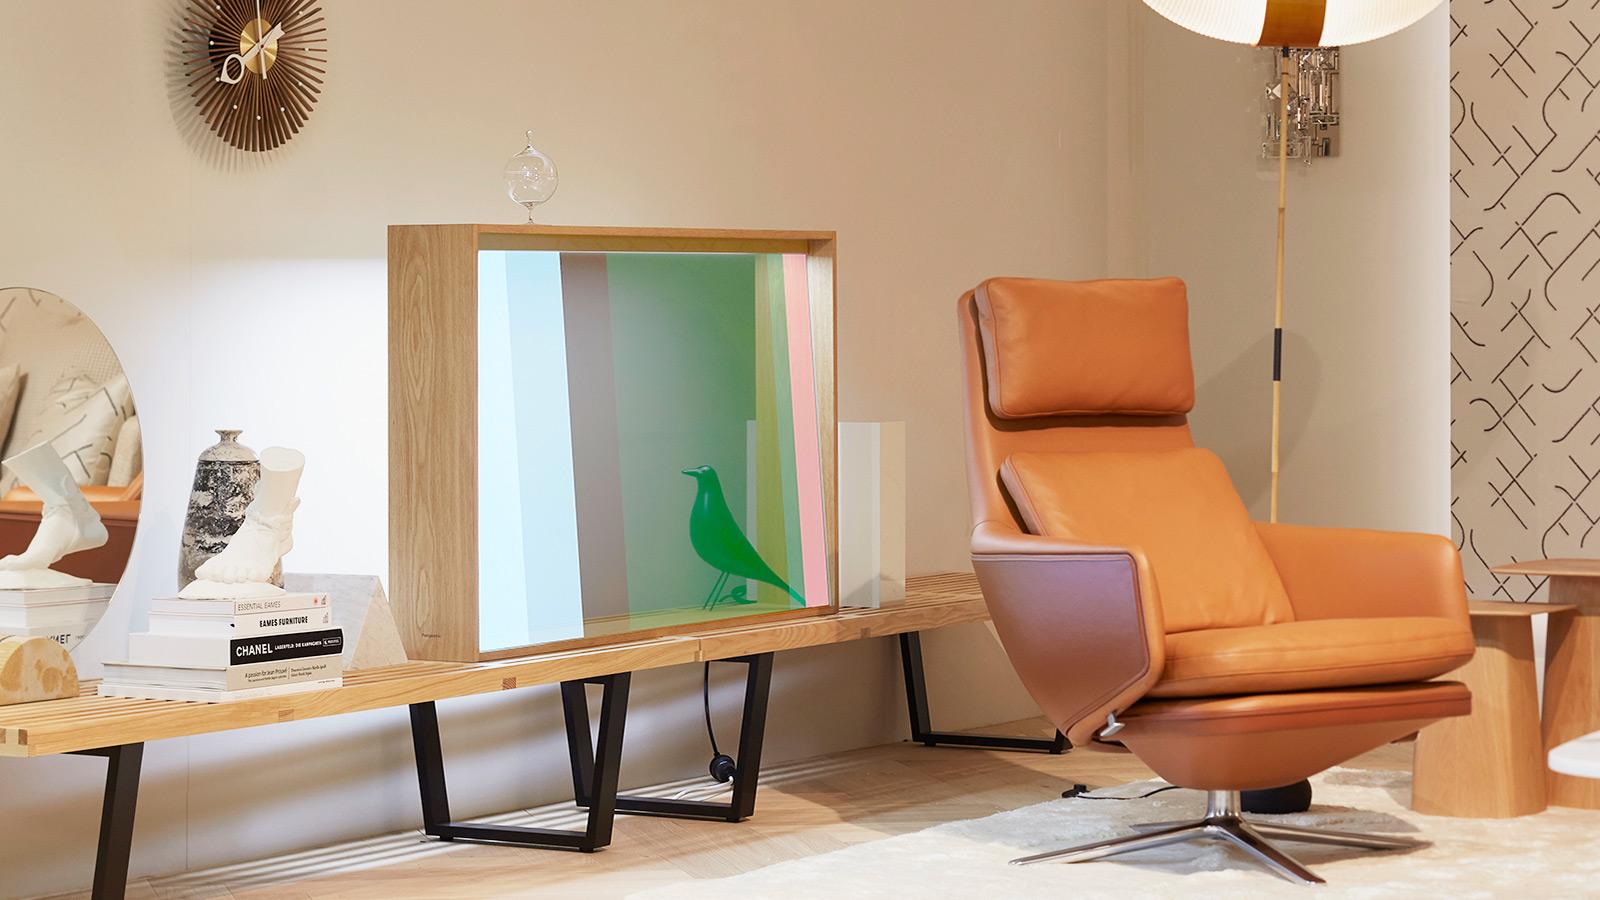 PanasonicVitrine Transparent OLED Concept Display